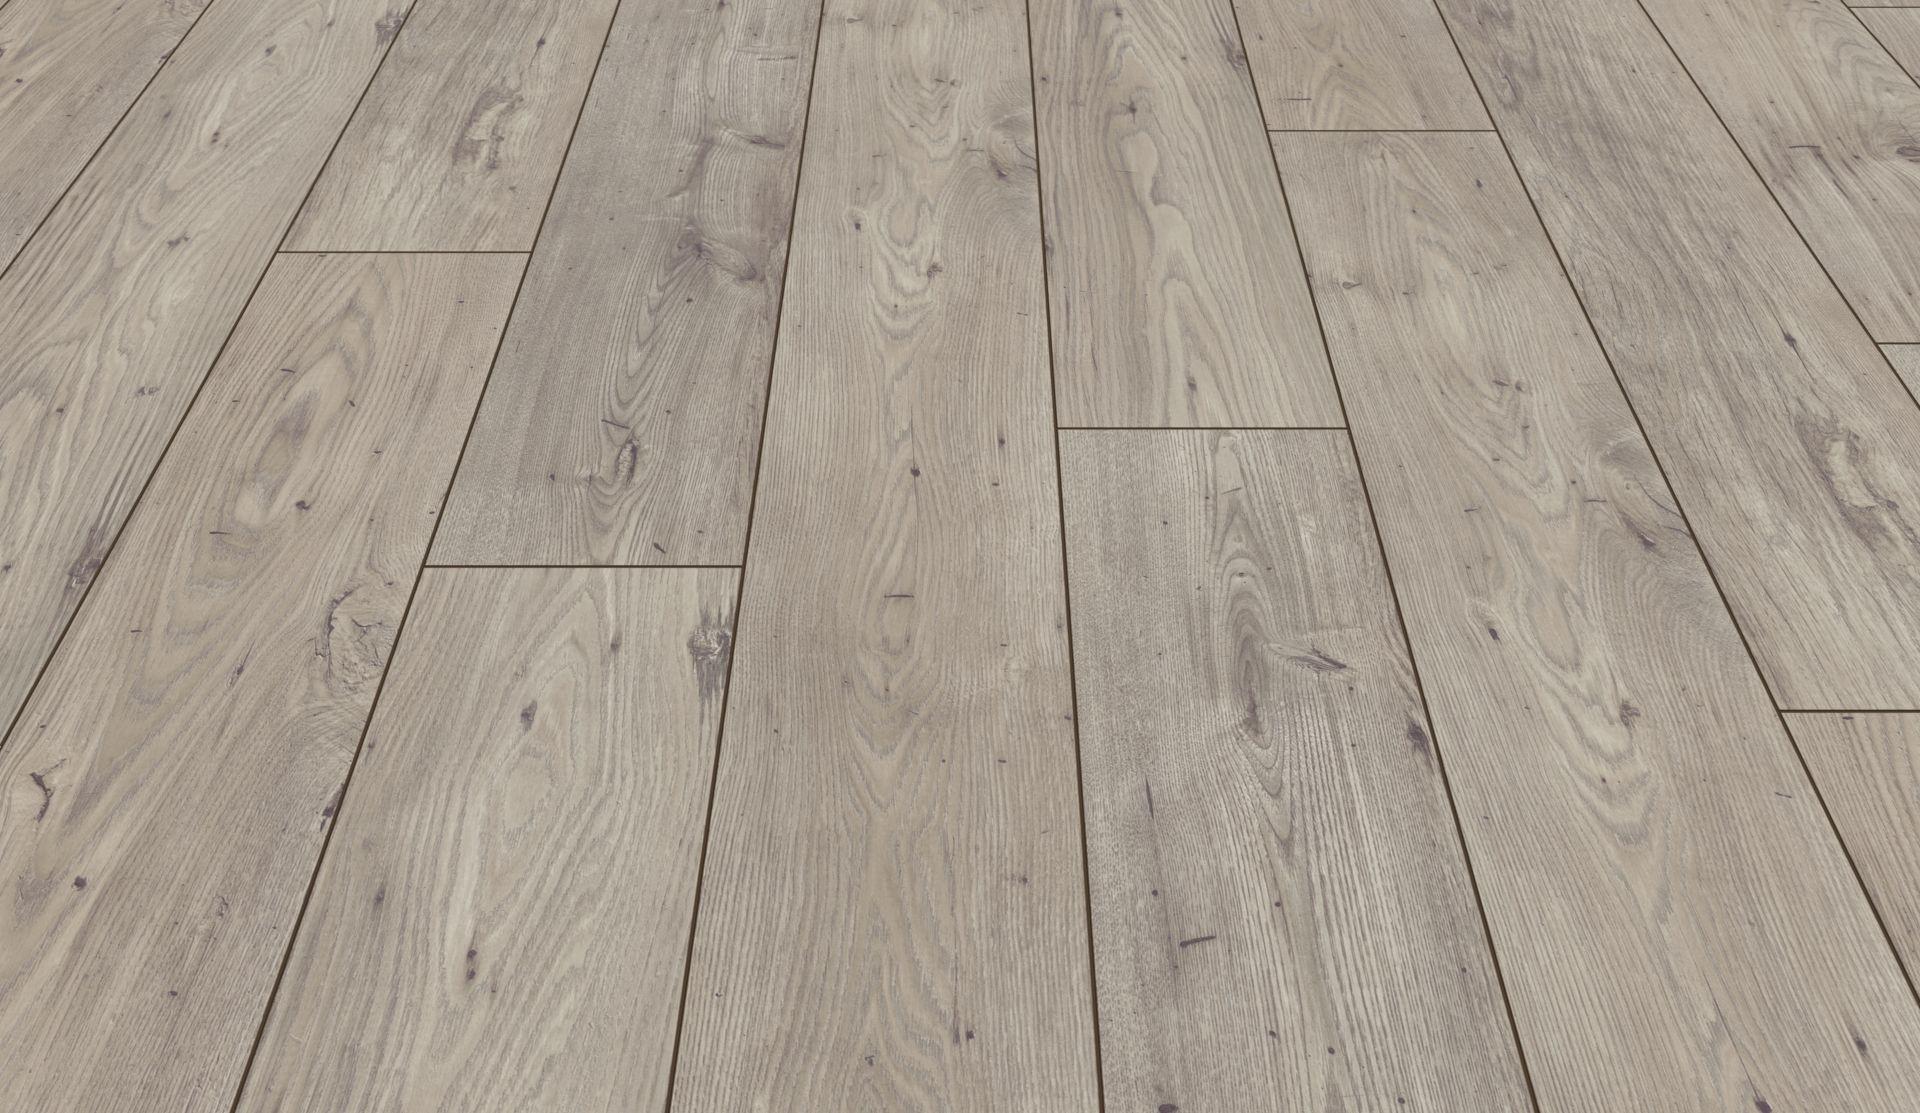 hardwood floor refinishing des moines of chestnut beige chalet m1002 er www my floor com find regarding my floor chestnut beige chalet